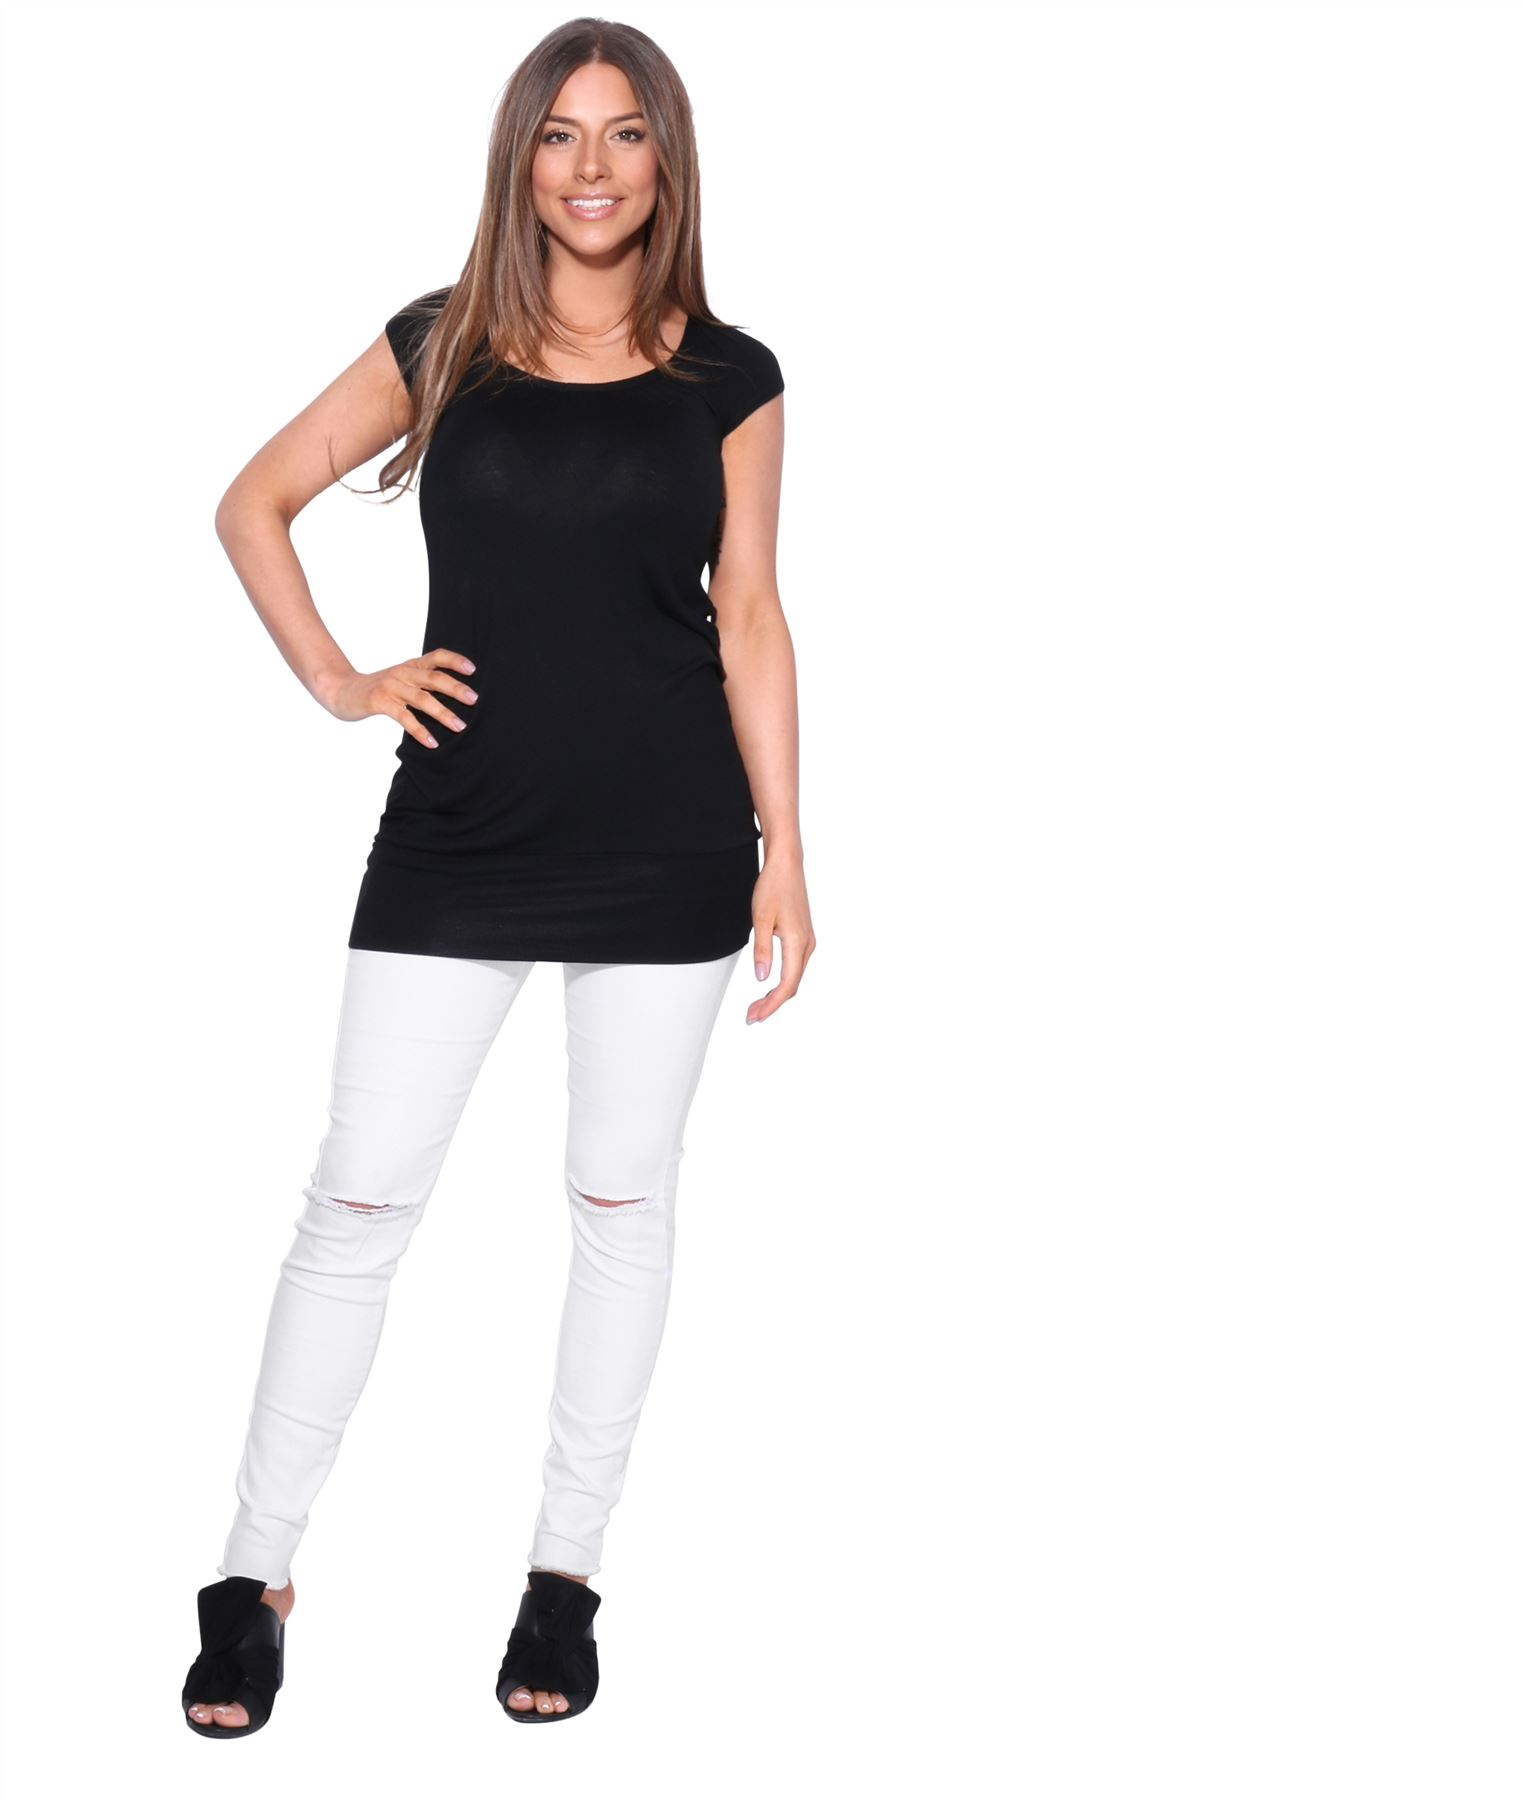 Womens-Ladies-Plain-T-Shirt-Short-Sleeve-Long-Loose-V-Neck-Blouse-Tunic-Top thumbnail 8